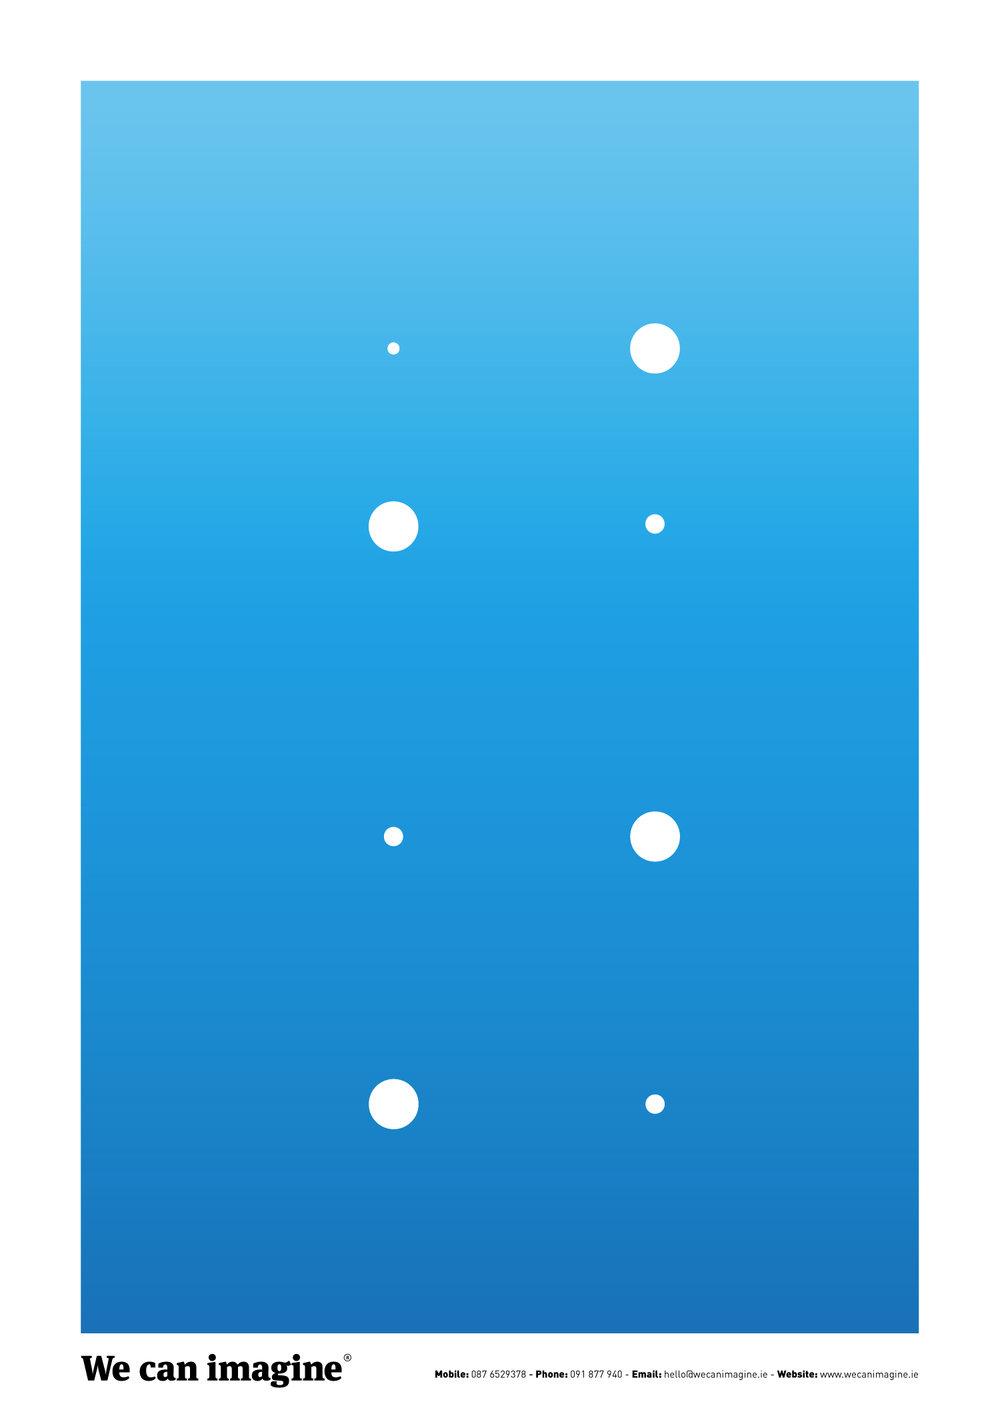 Graphic design golden grid poster